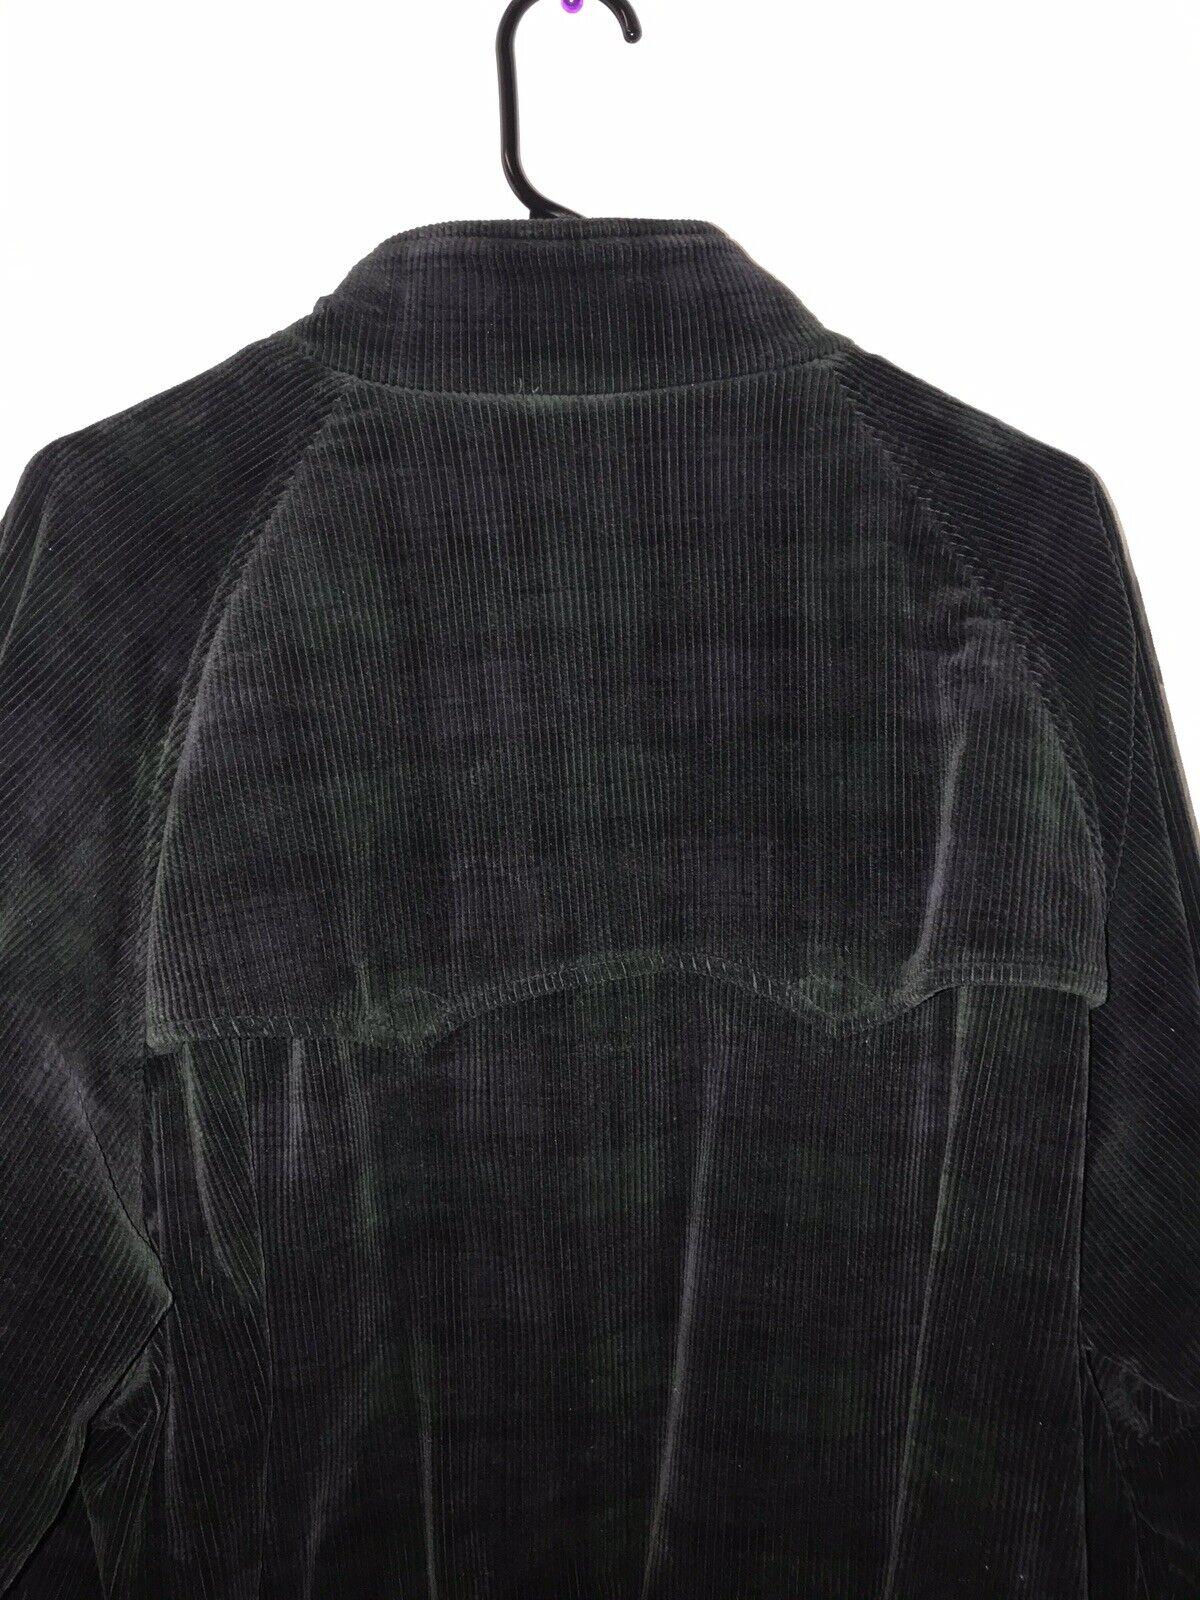 Vintage Polo Ralph Lauren Corduroy Coat Rare 80's… - image 4